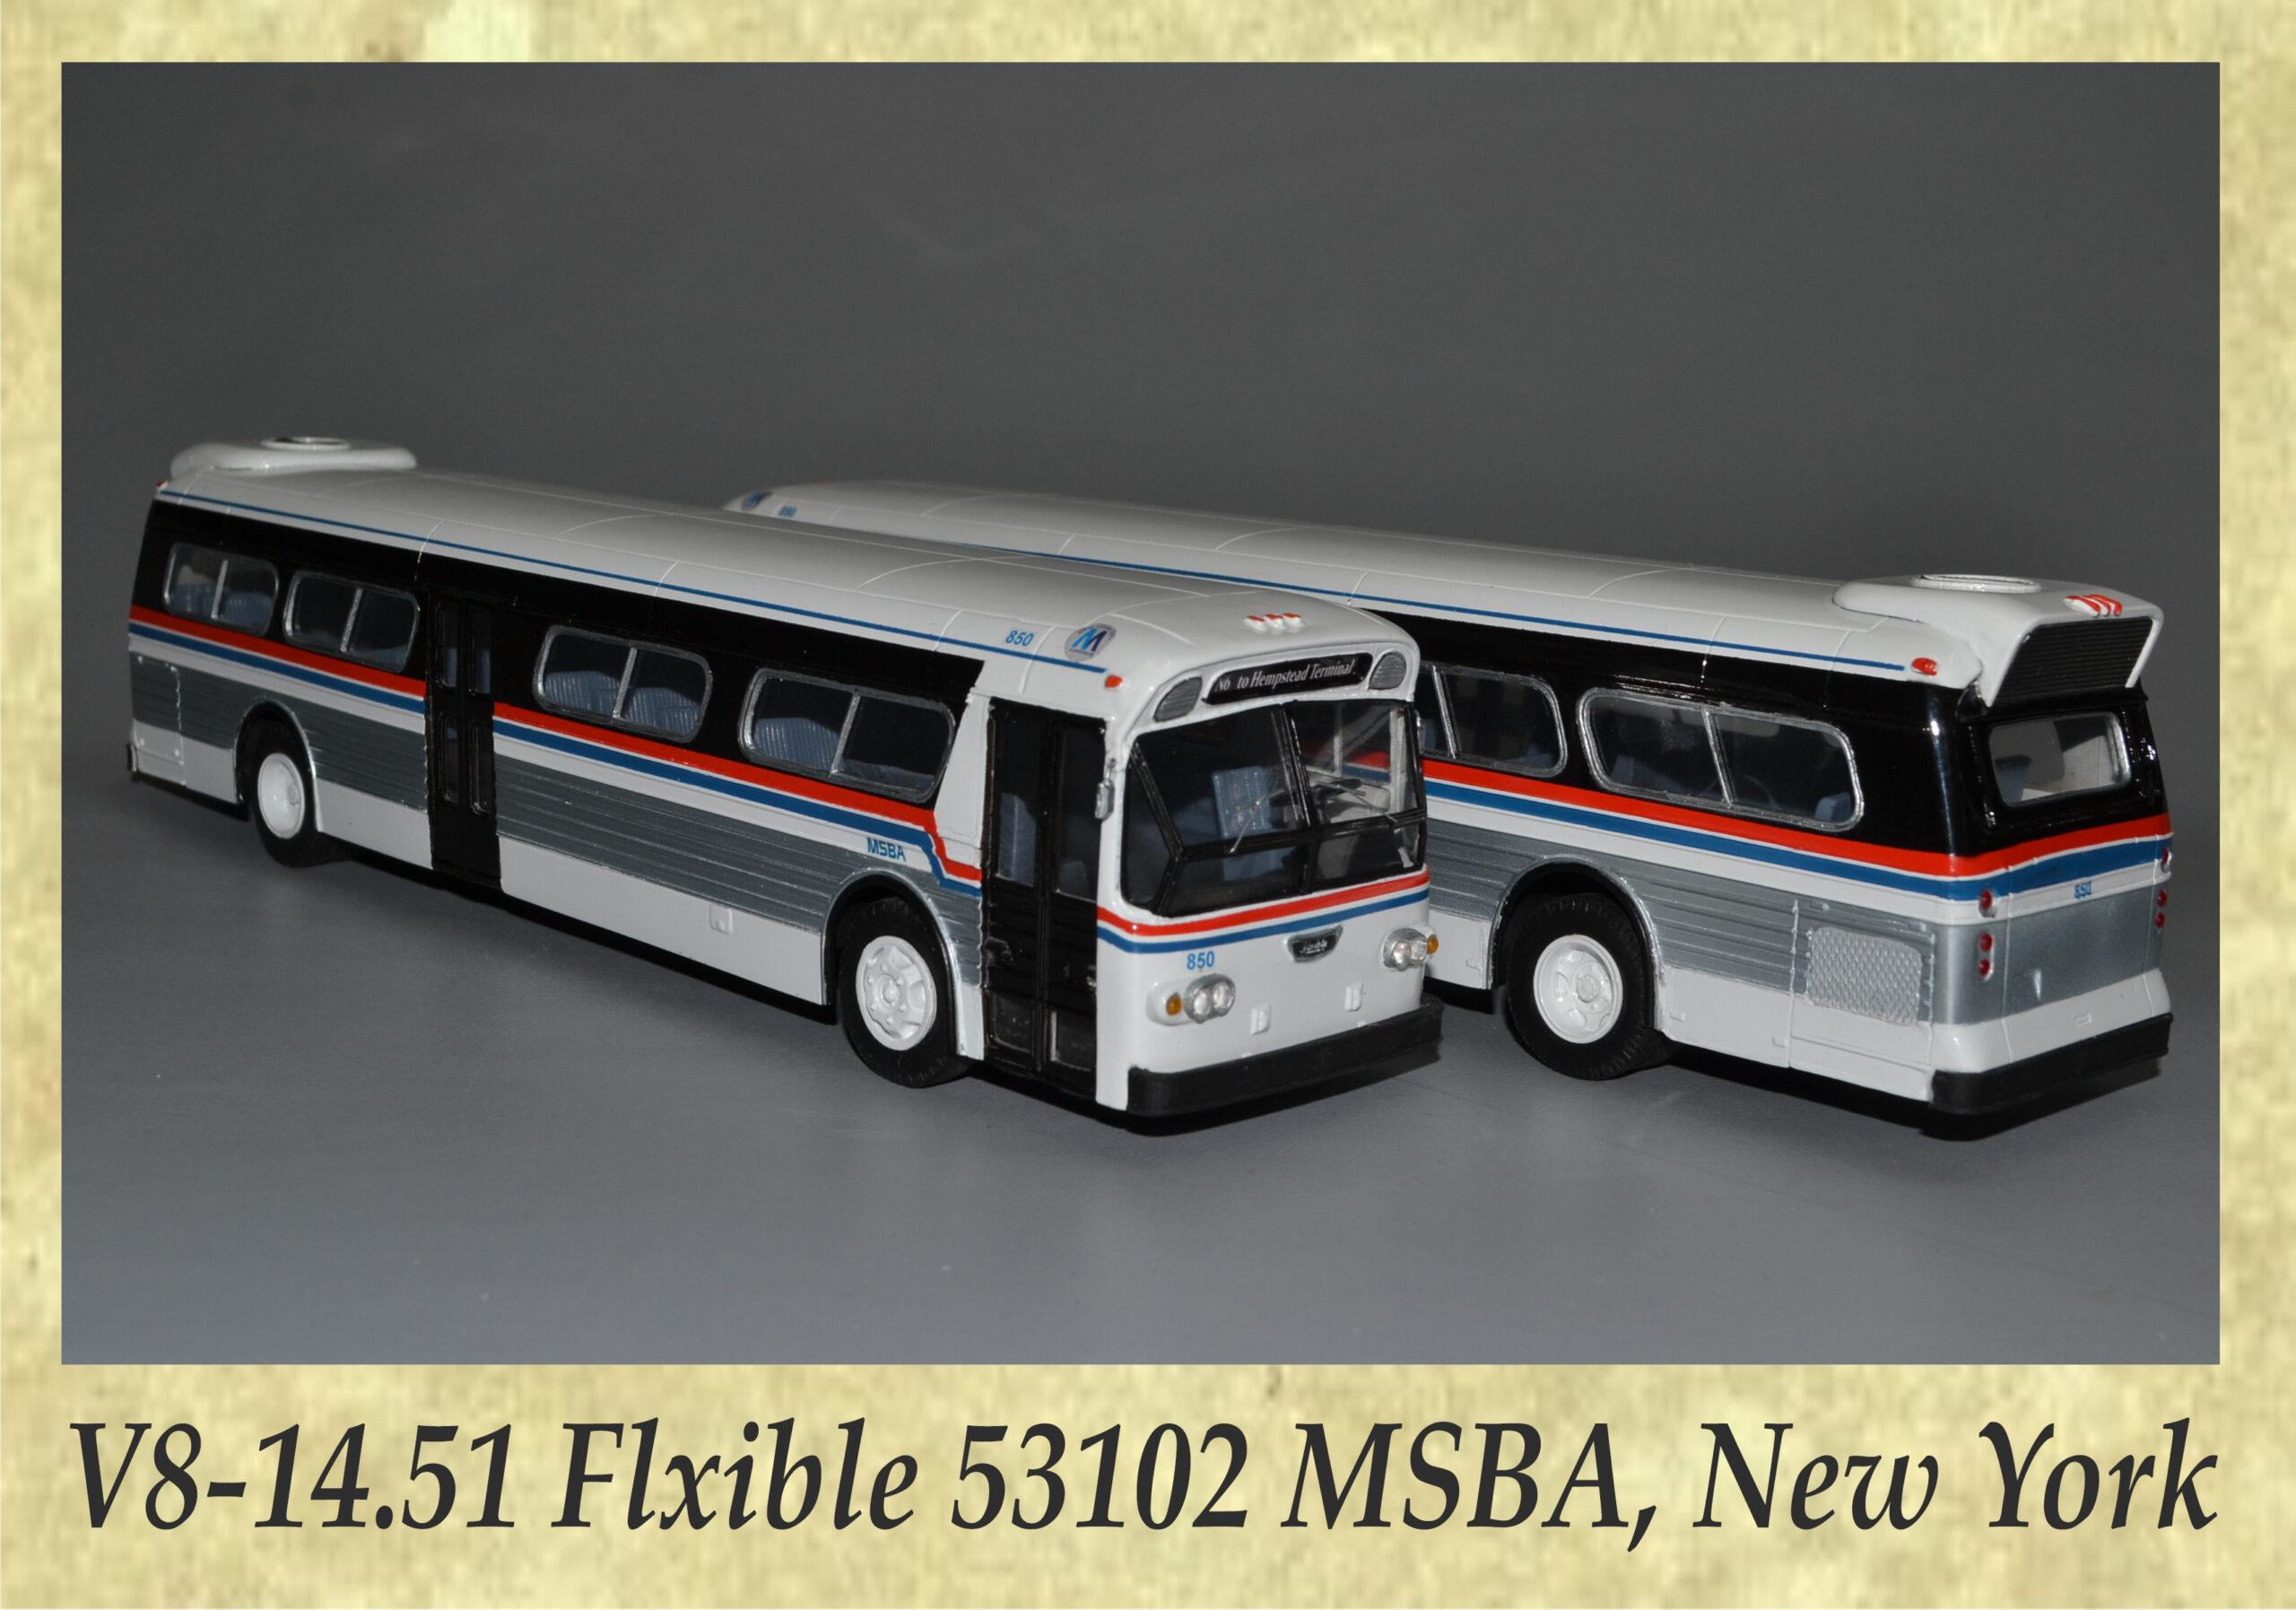 V8-14.51 Flxible 53102 MSBA, New York